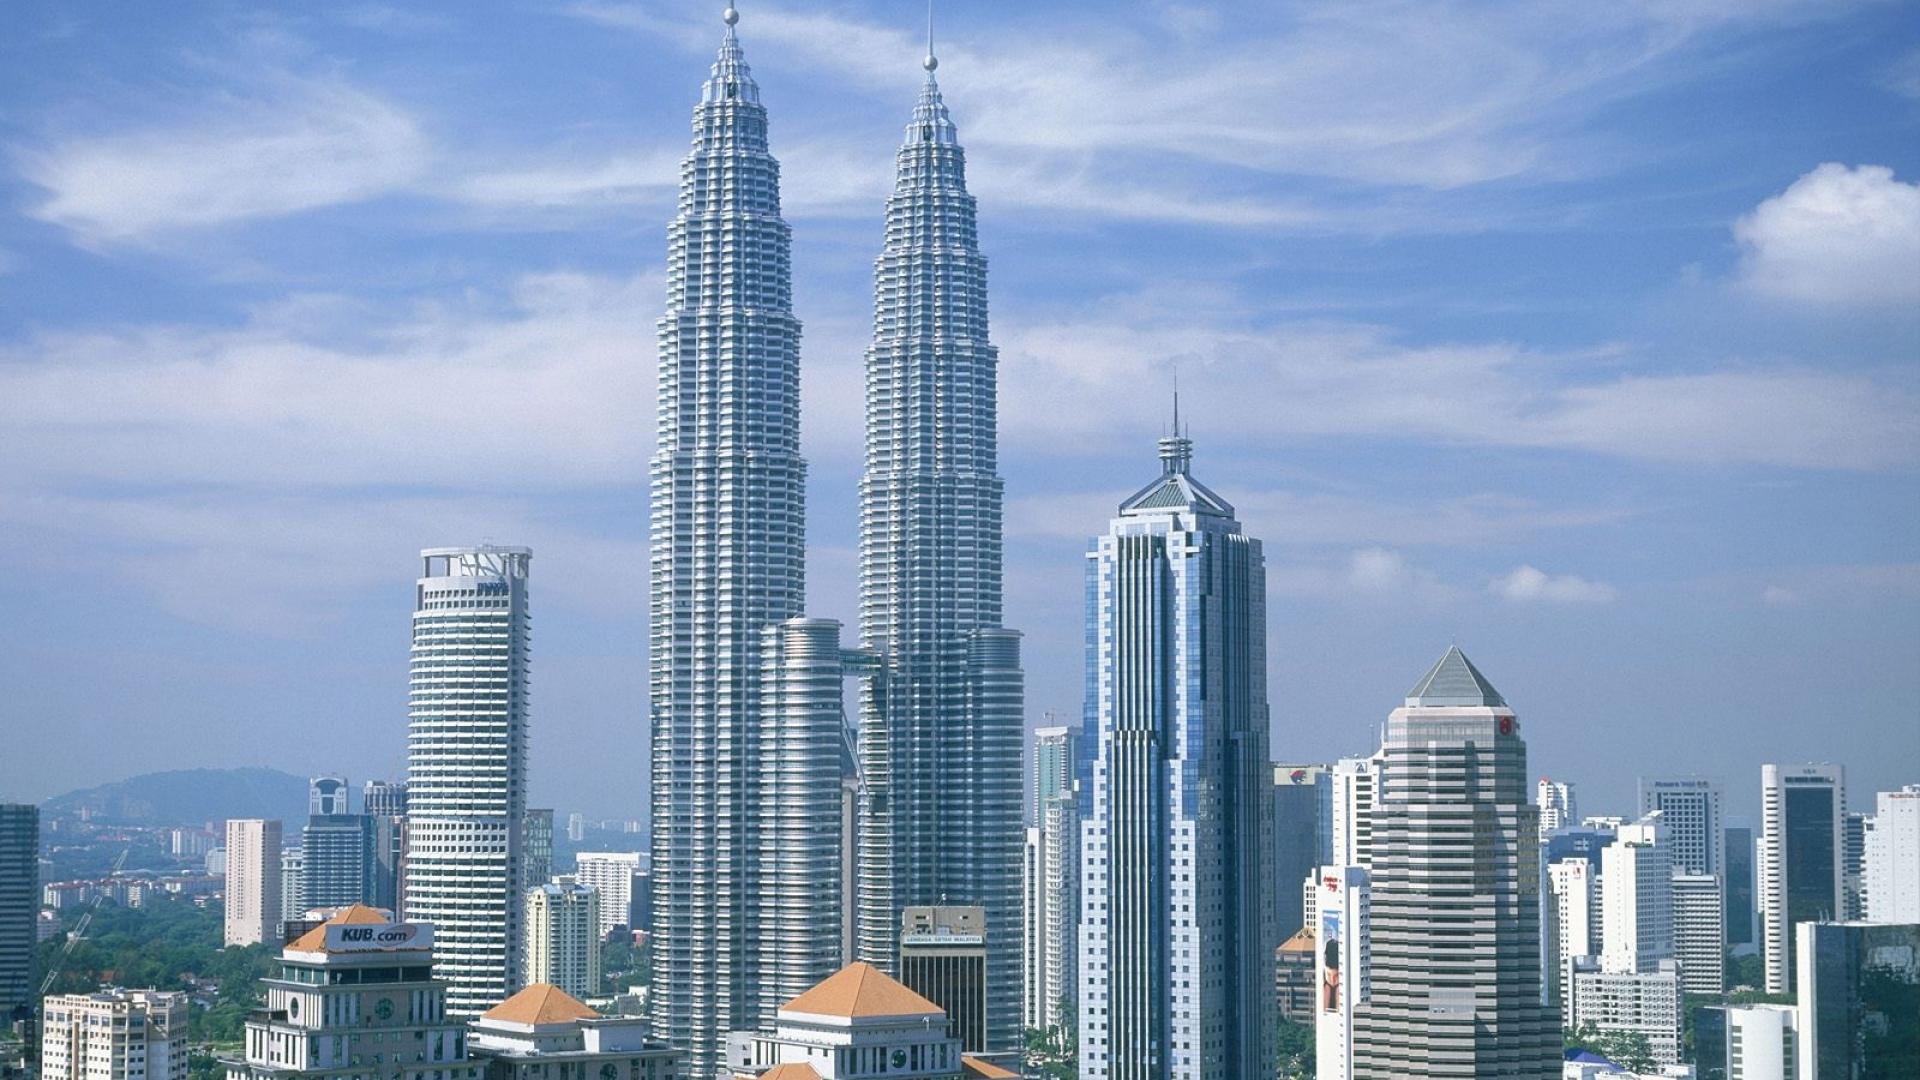 Malaysia Building White Stone Sky Skyscrapers 694 1920x1080